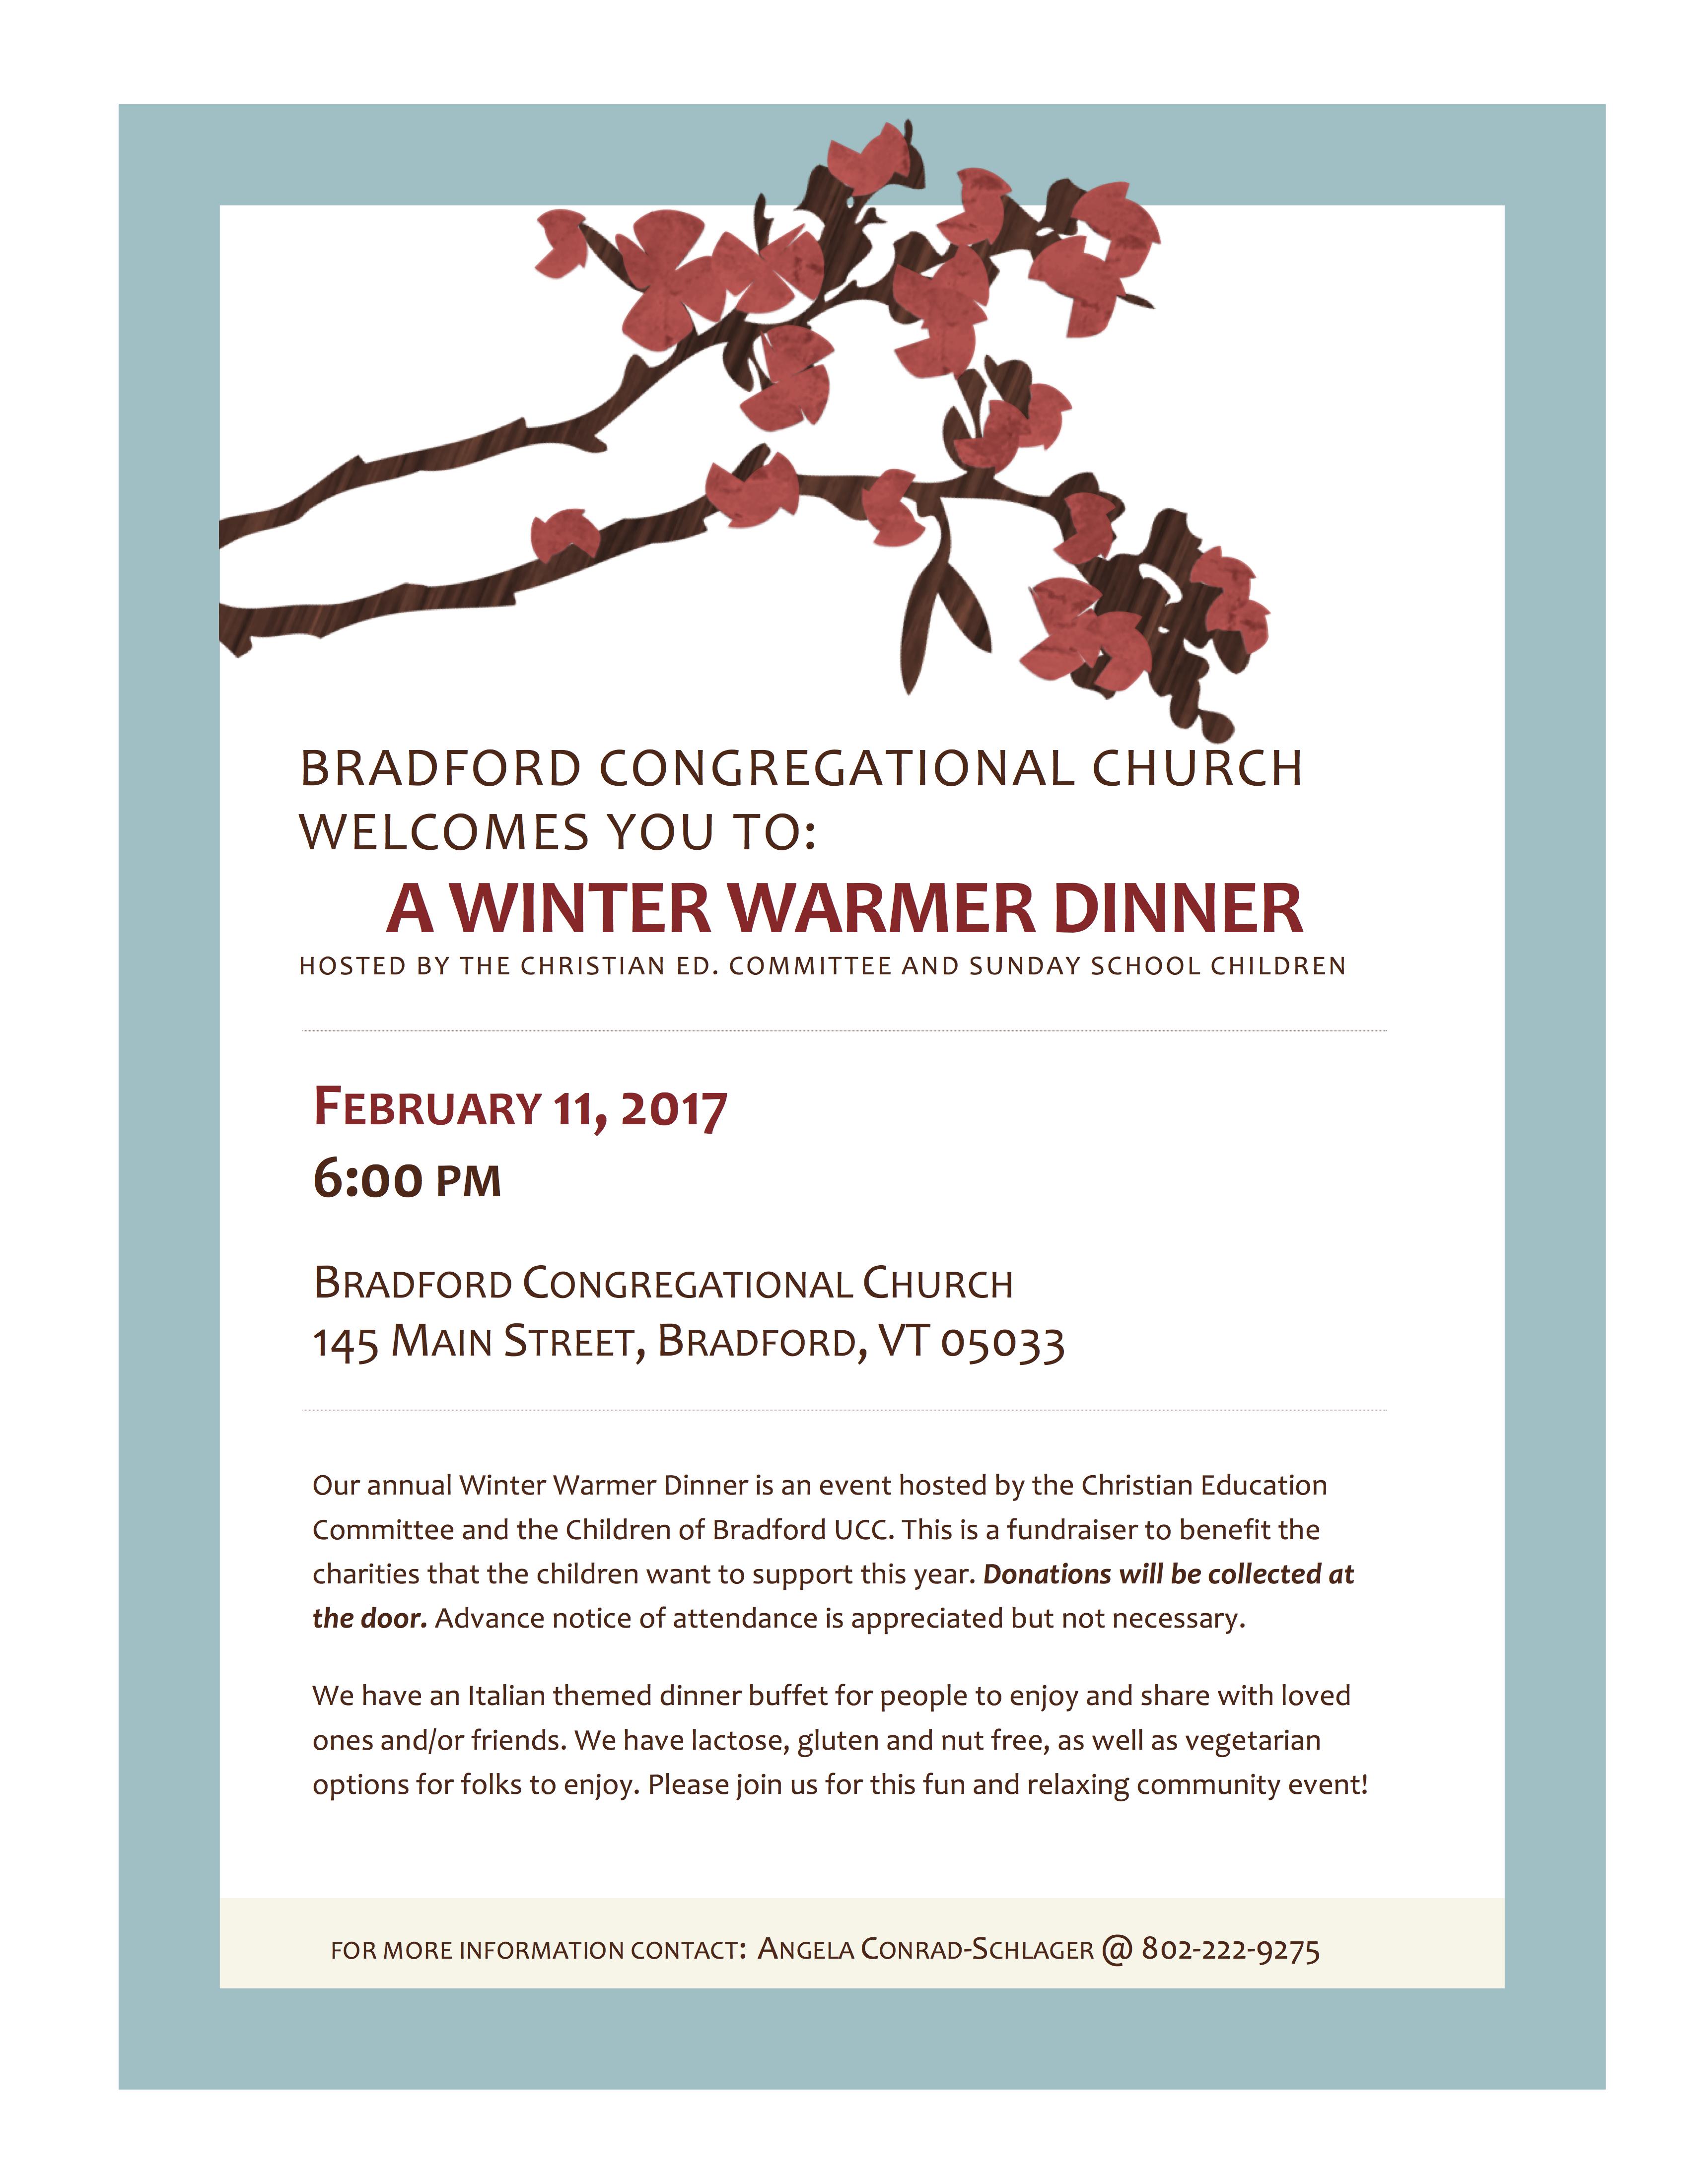 Winter Warmer Dinner 2017 | Bradford UCC